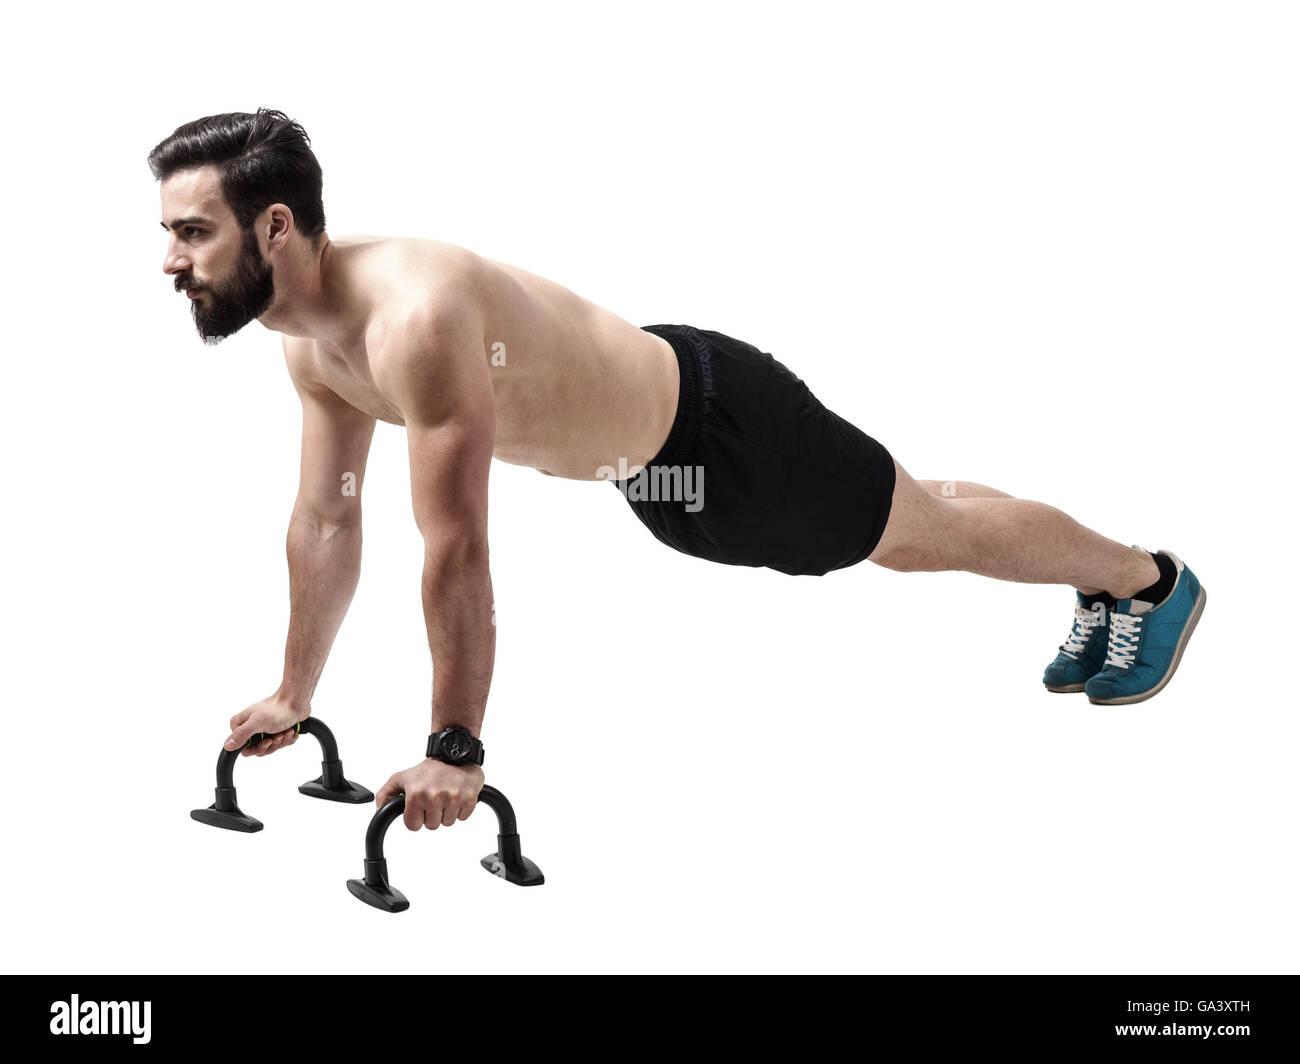 Nackter Oberkörper muskulöse Athleten macht Liegestütze auf Push-up ...